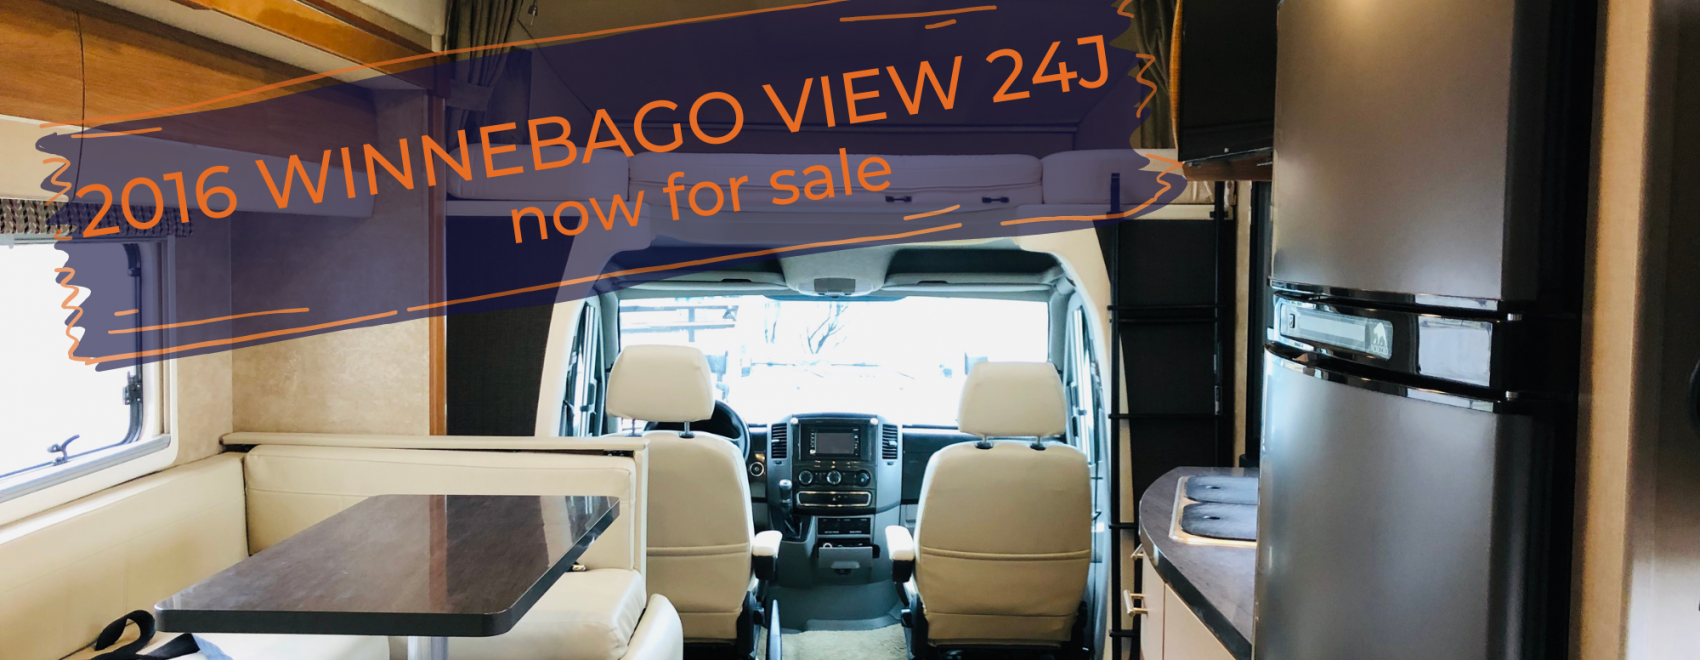 2016 Winnebago View 24J for Sale